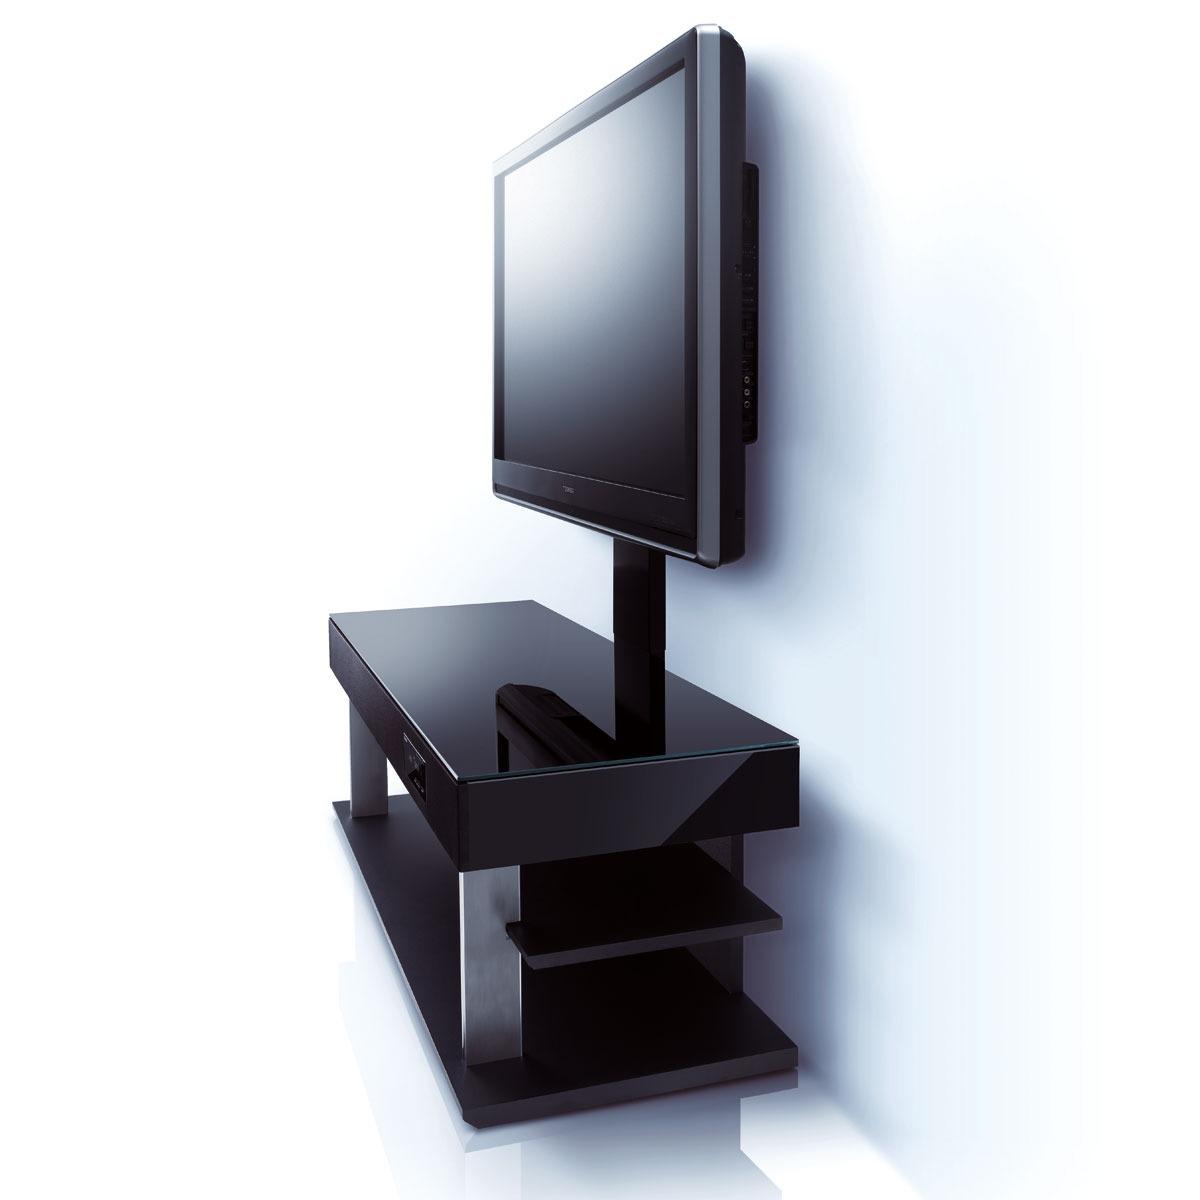 yamaha yrs 1000 barre de son yamaha sur. Black Bedroom Furniture Sets. Home Design Ideas